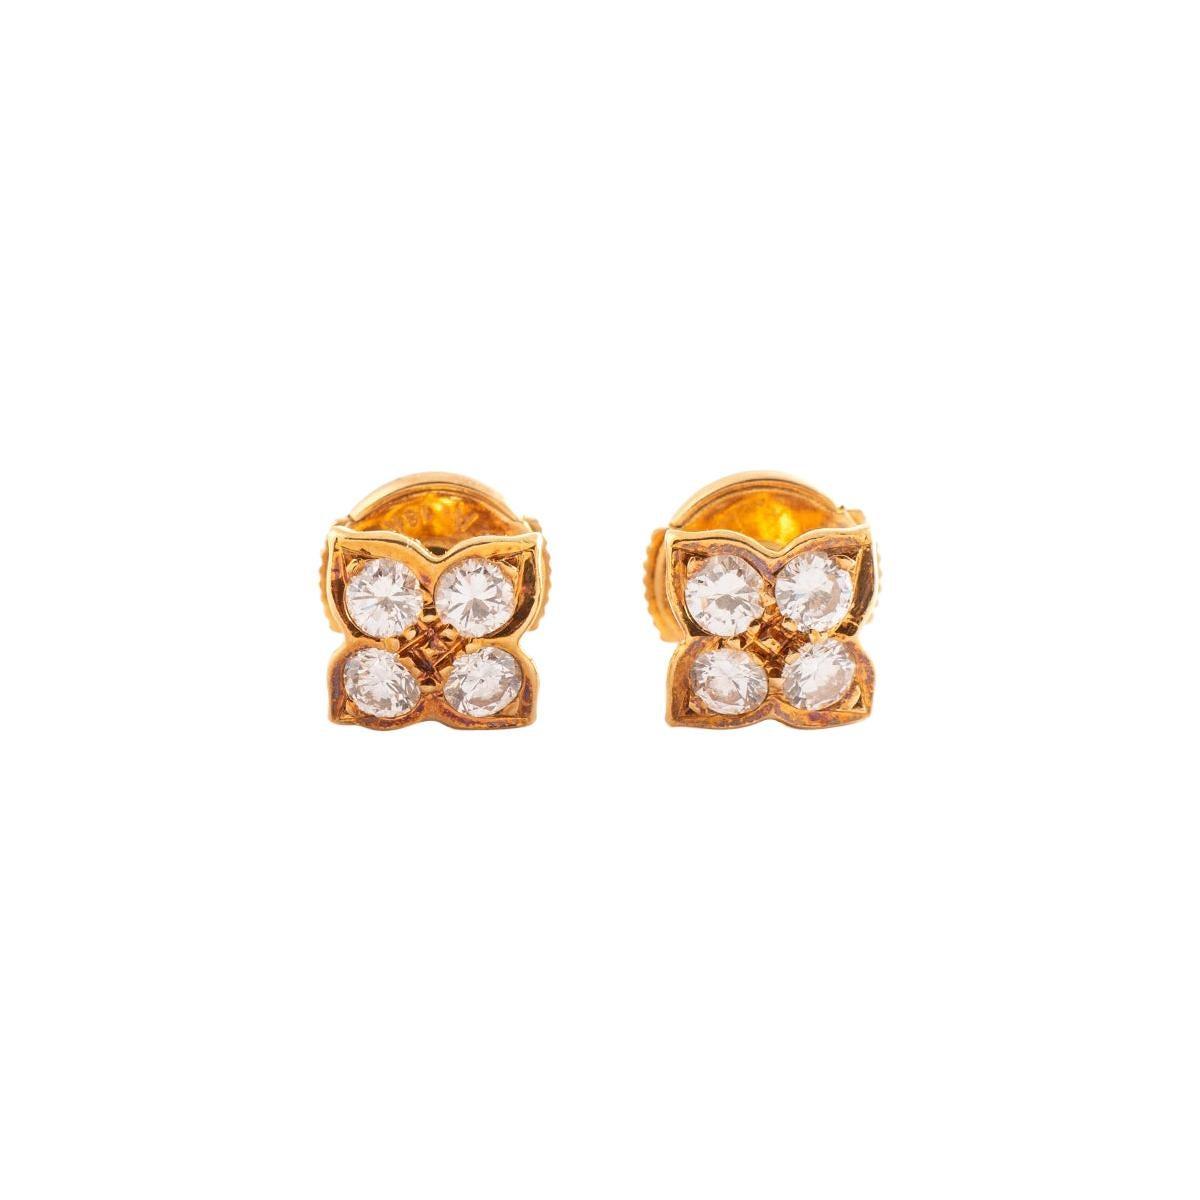 Ear Studs Earrings Floral Diamond Yellow Gold